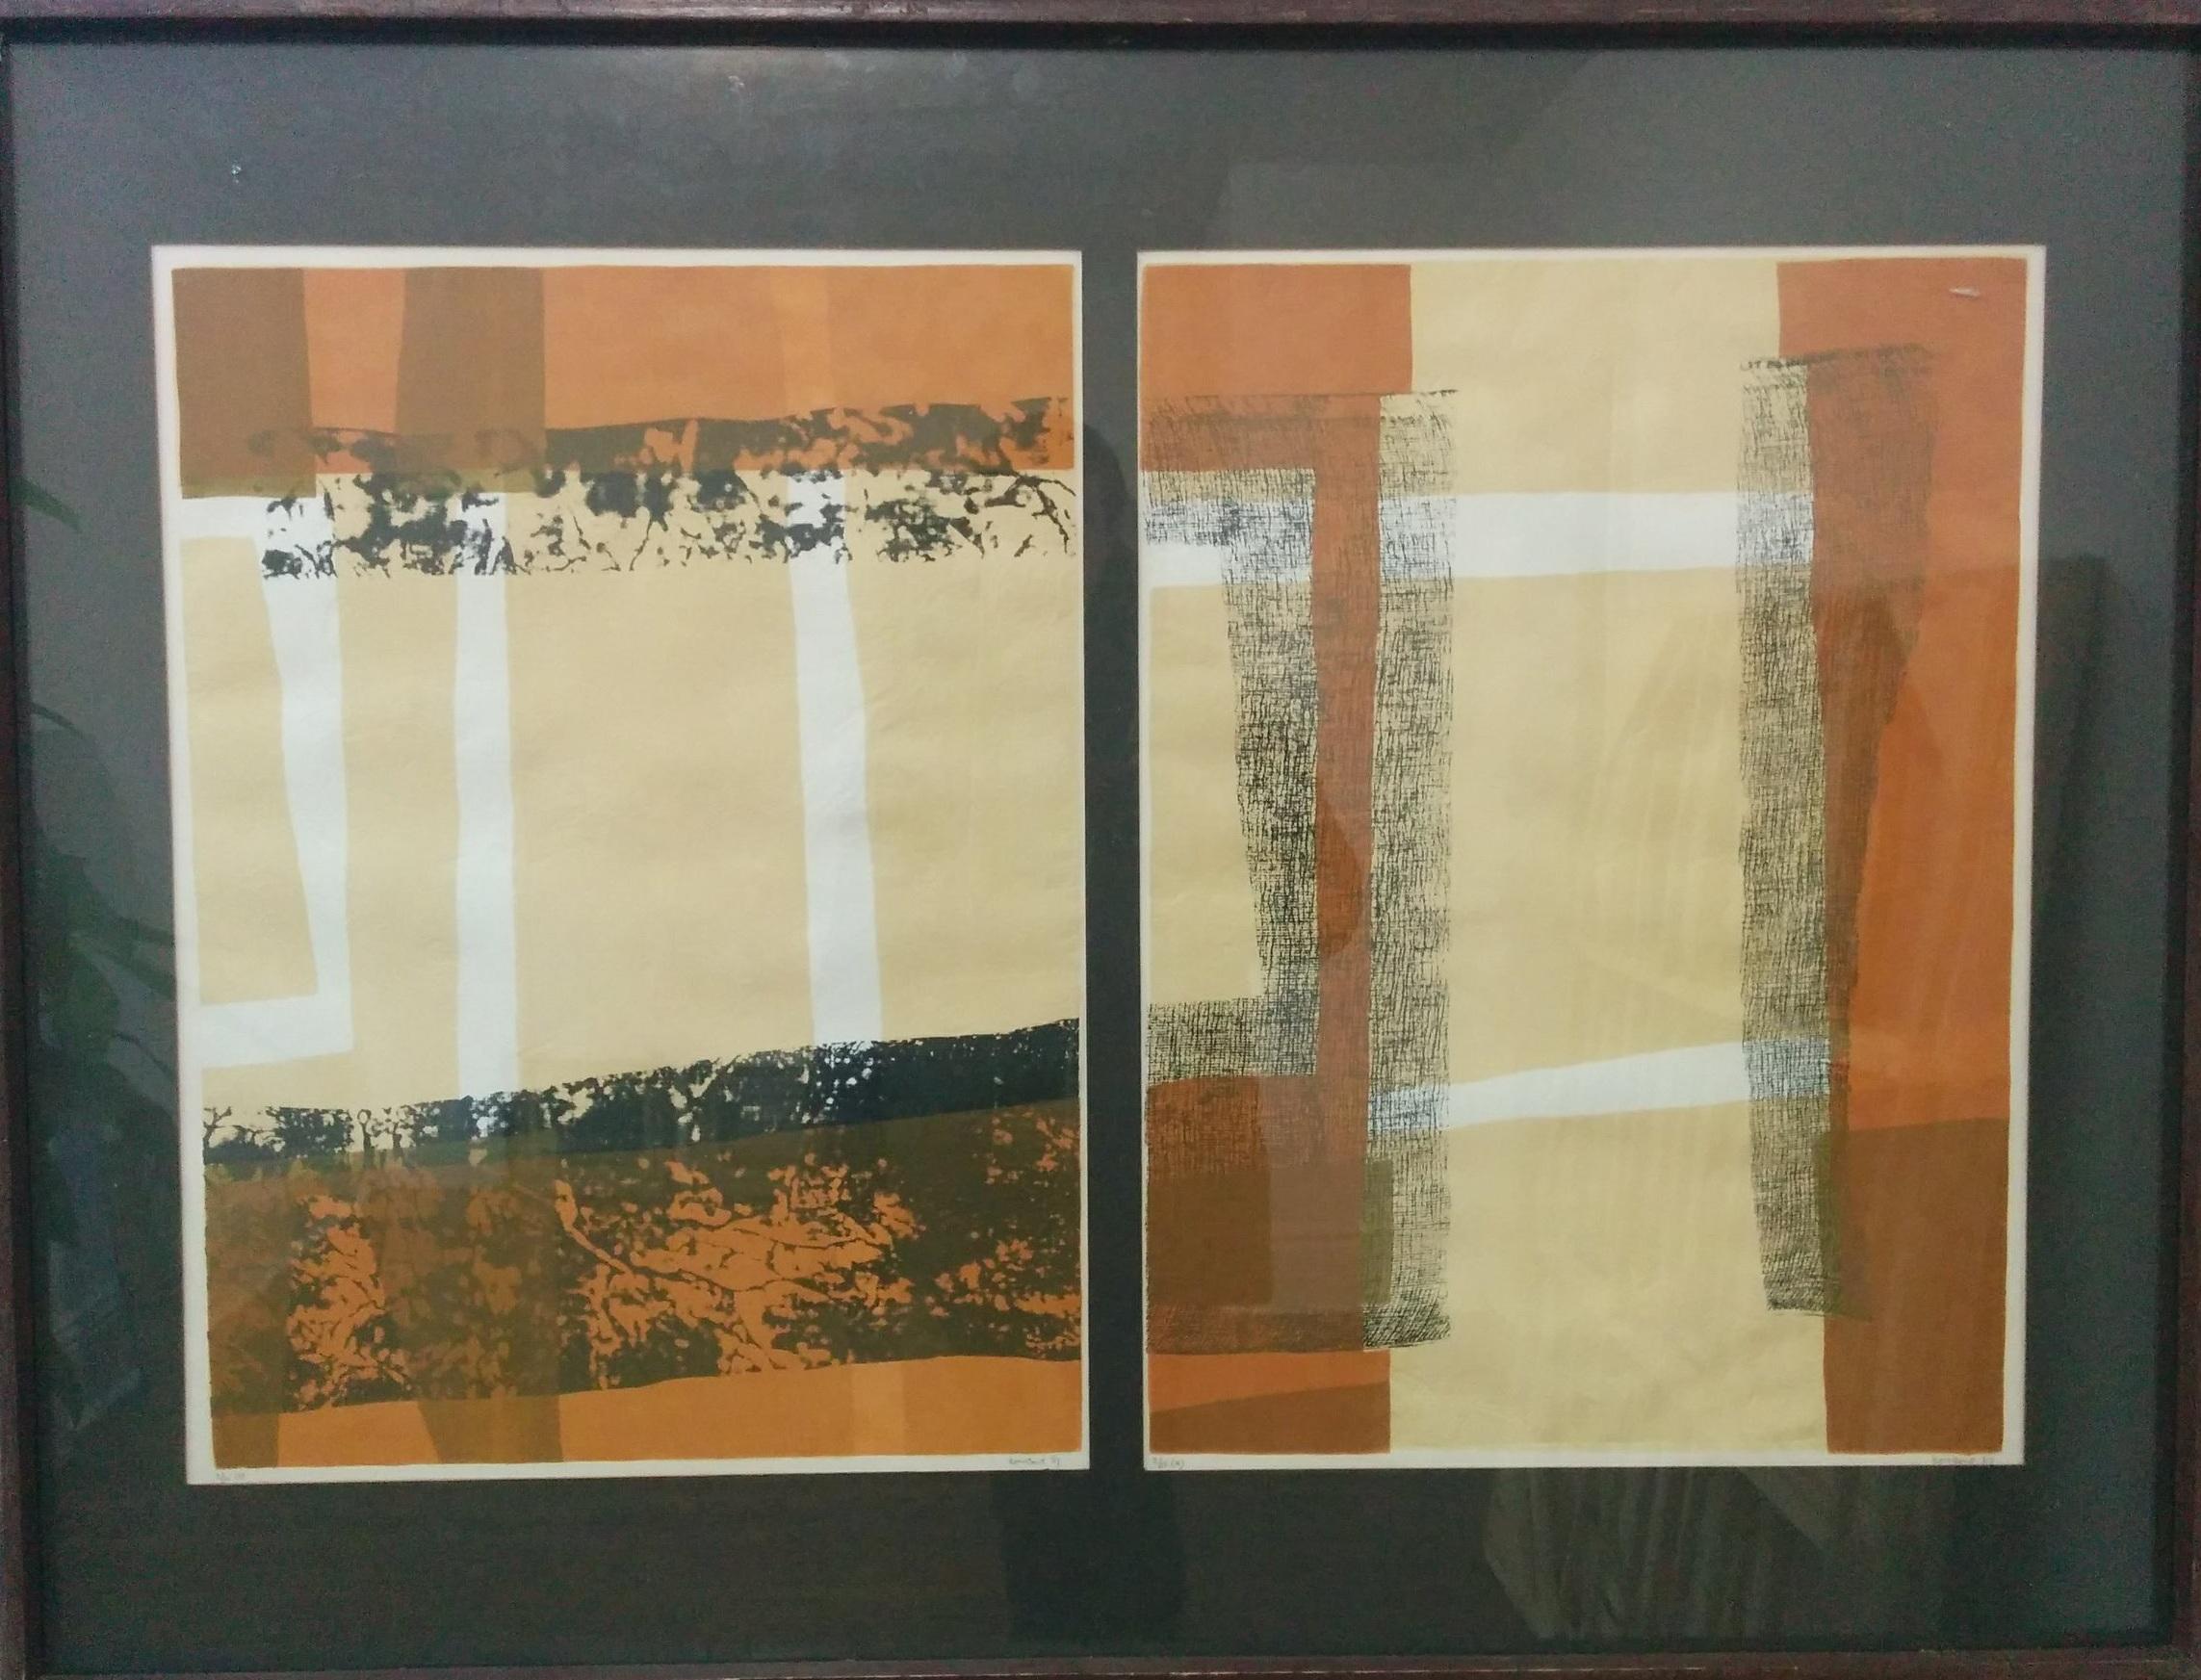 Luke Rombout - Seriagraph, 1967, diptych, each 16